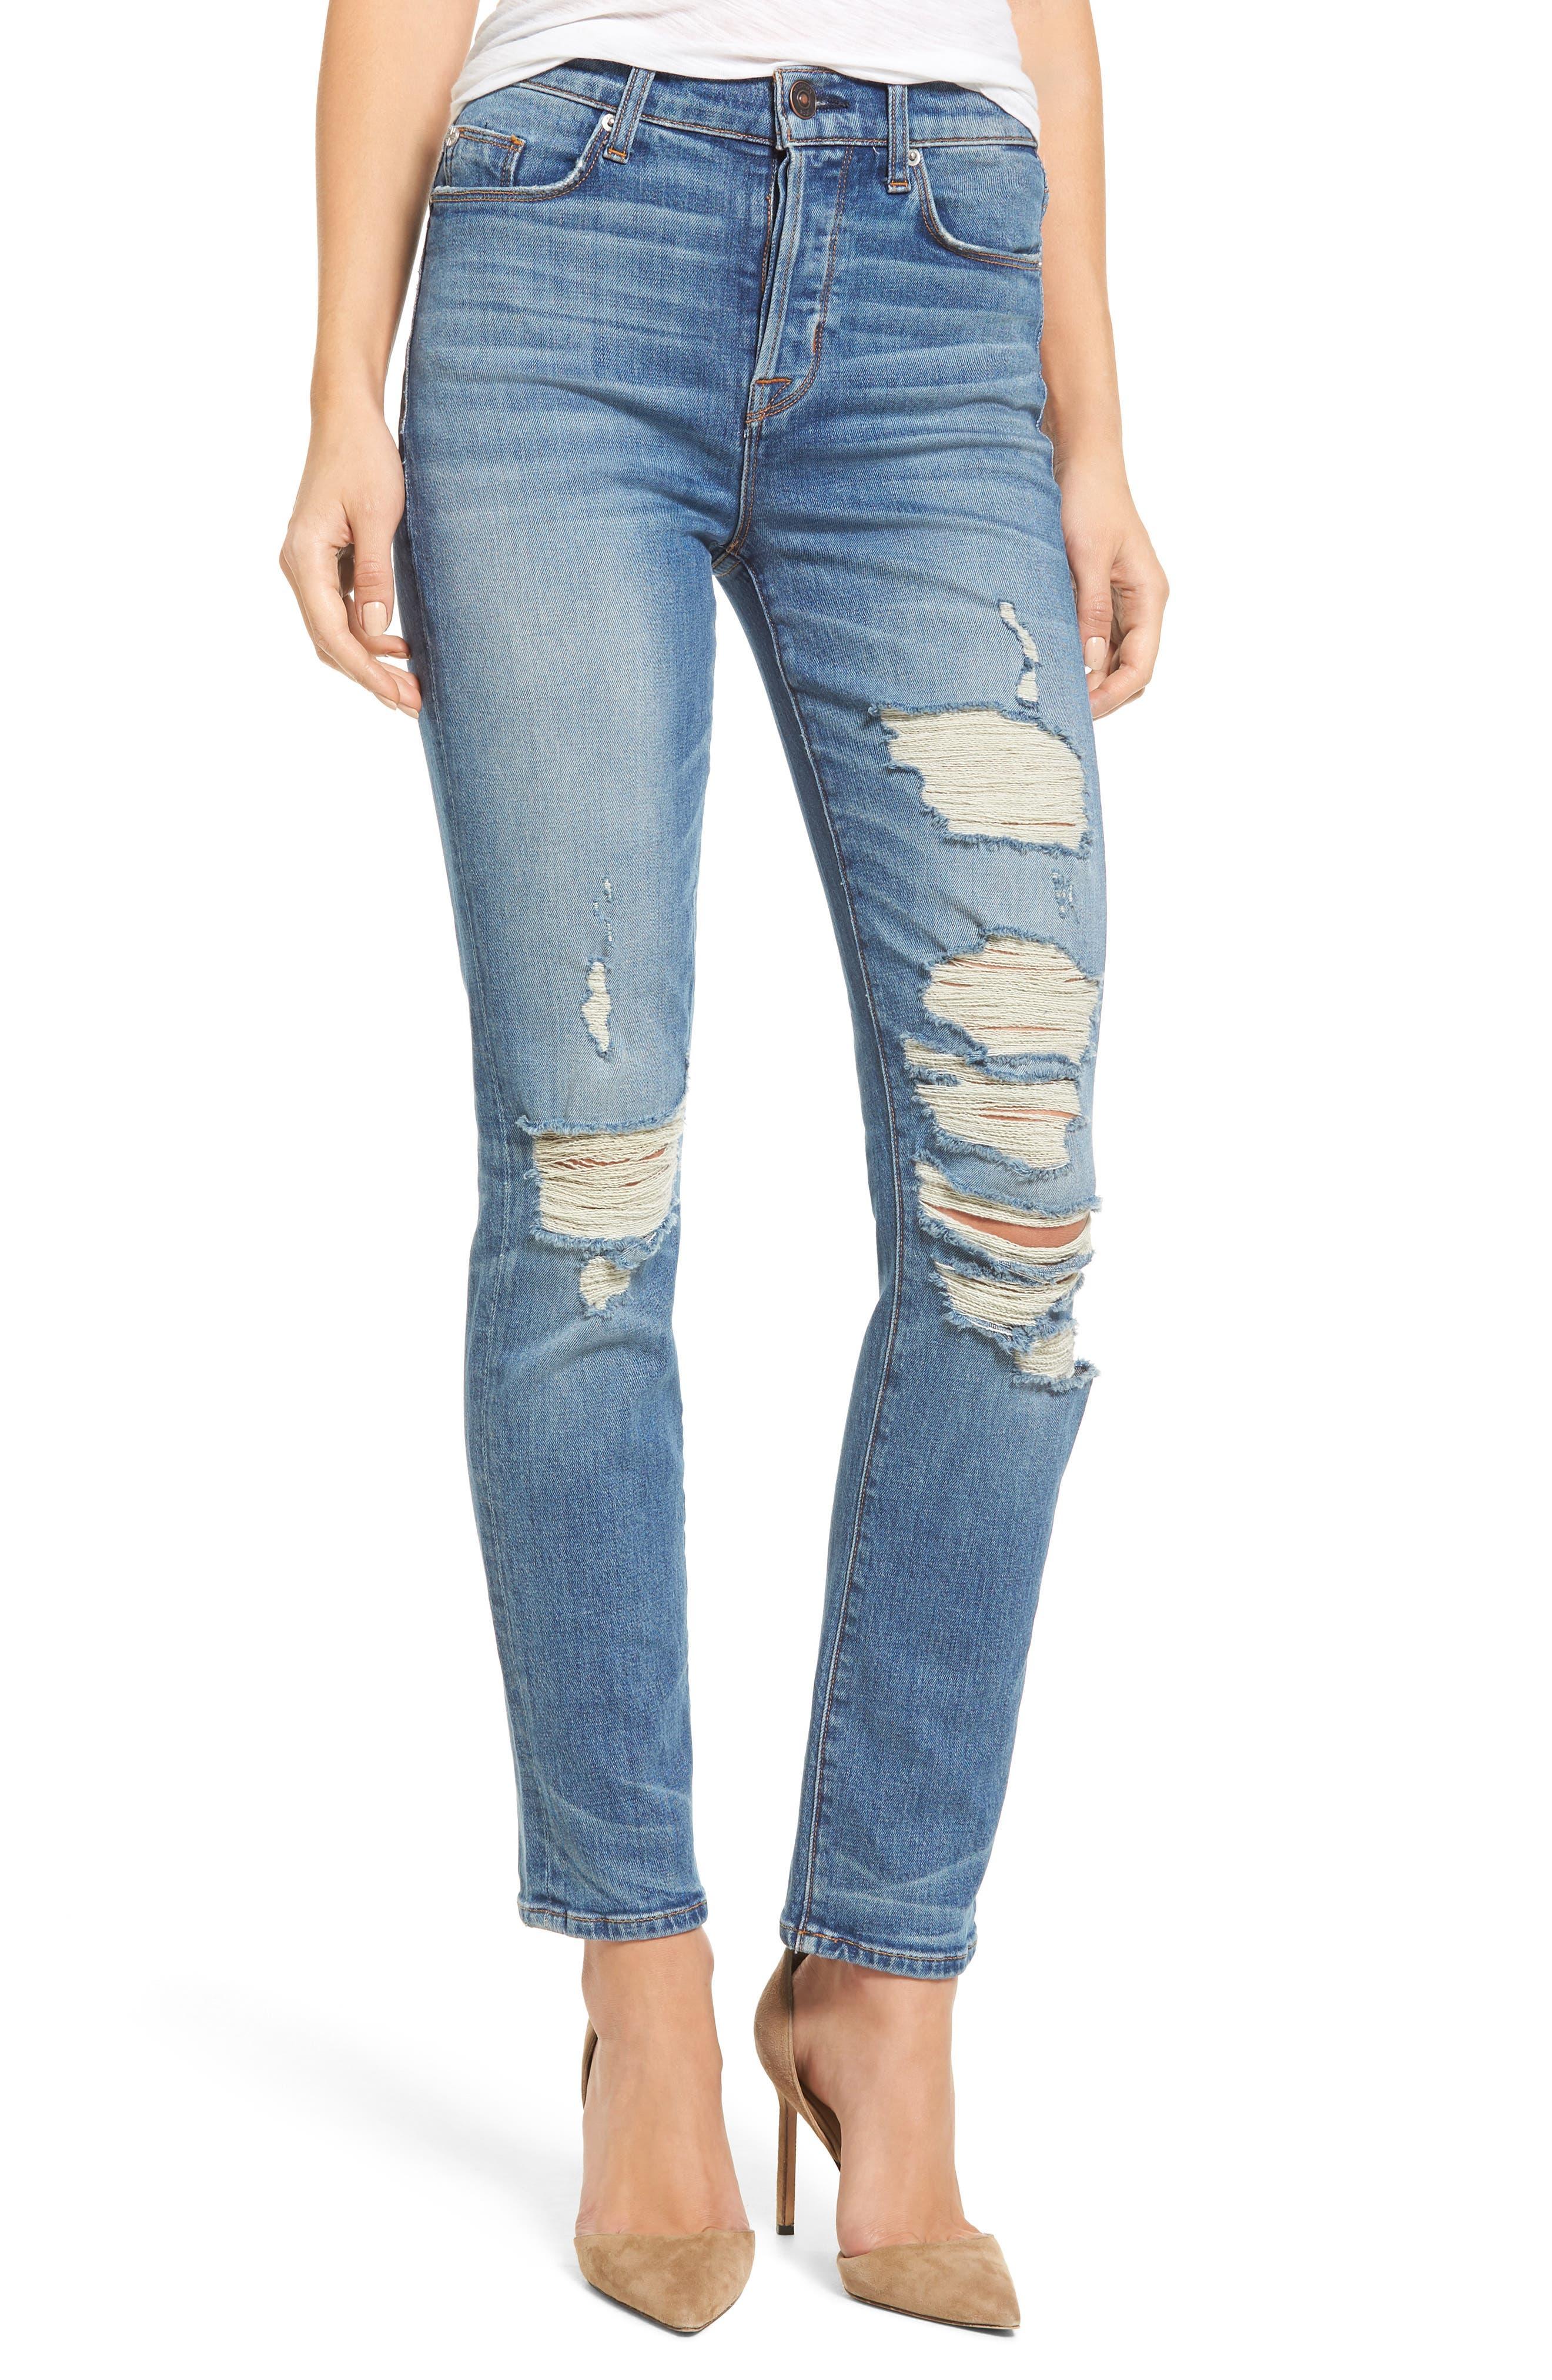 Zoeey High Waist Ankle Straight Leg Jeans,                             Main thumbnail 1, color,                             Kool